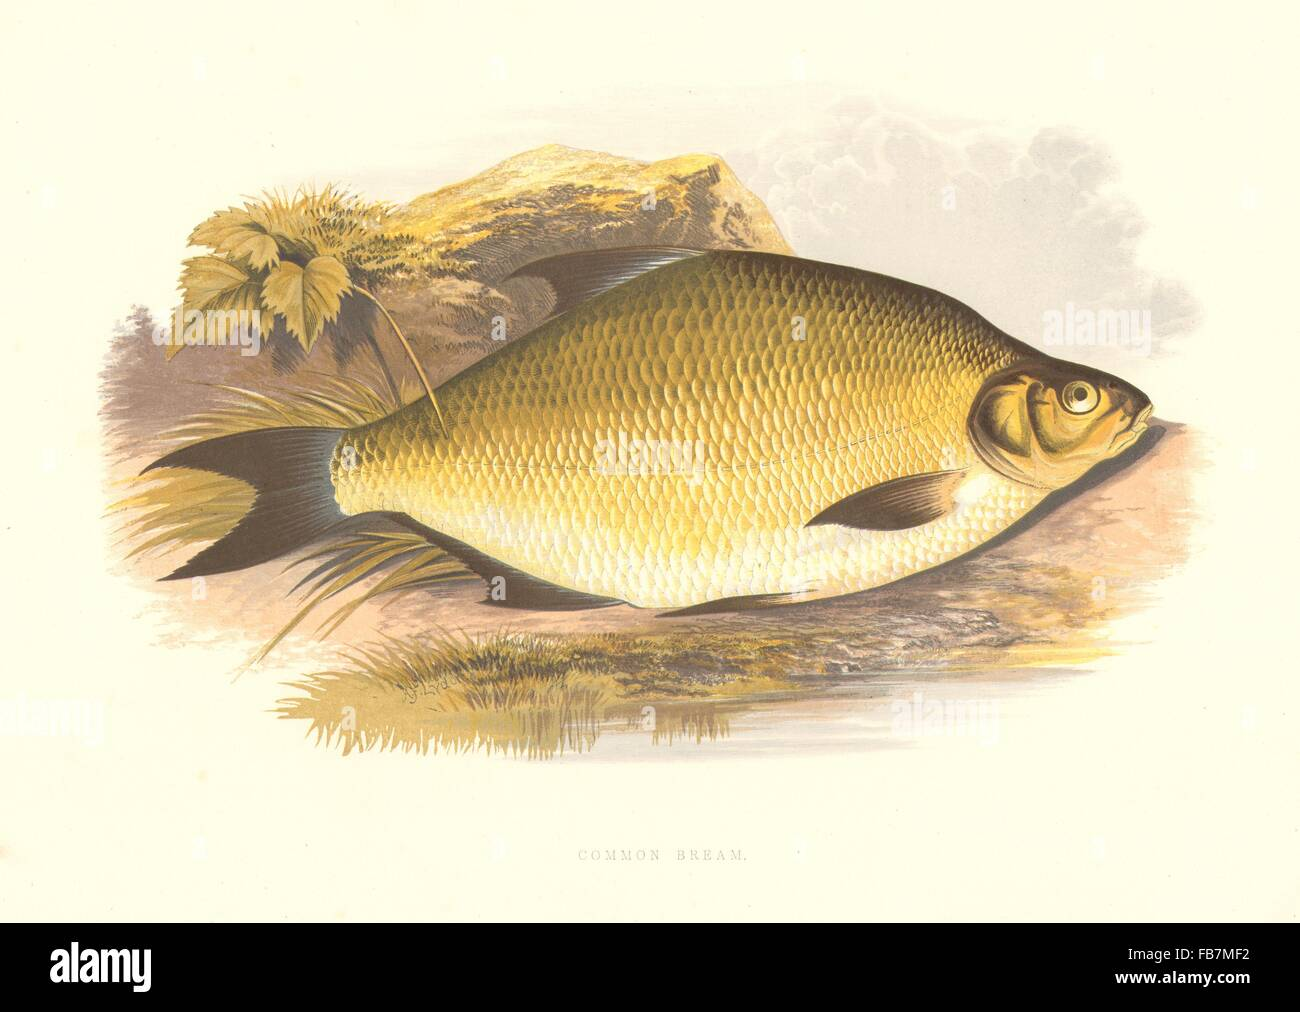 Freshwater fish england - Freshwater Fish Common Bream Abramis Brama Houghton Lydon Print 1879